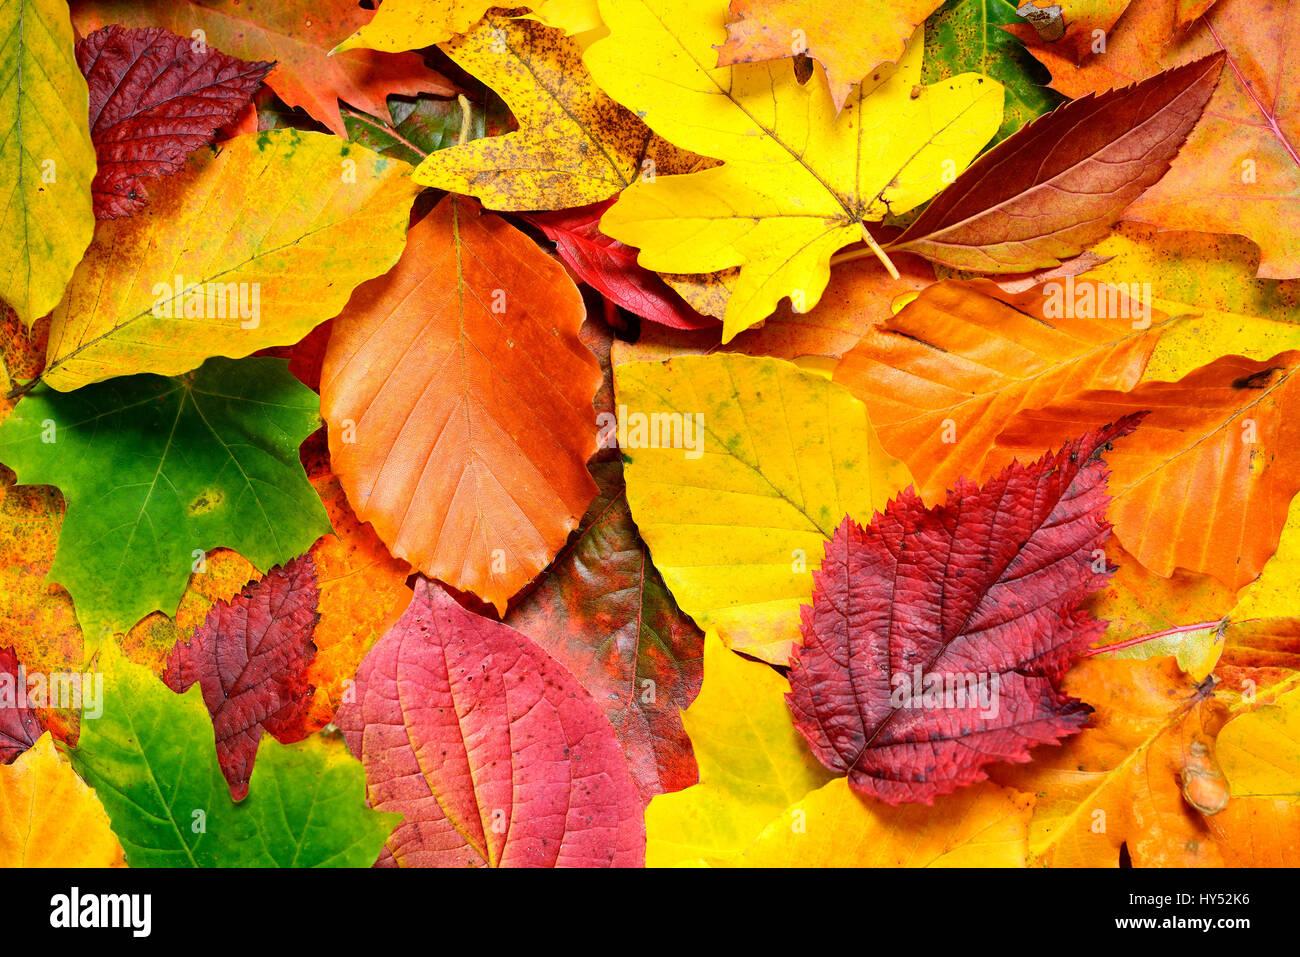 Coloured autumn sheets, Bunte Herbstblaetter Stock Photo